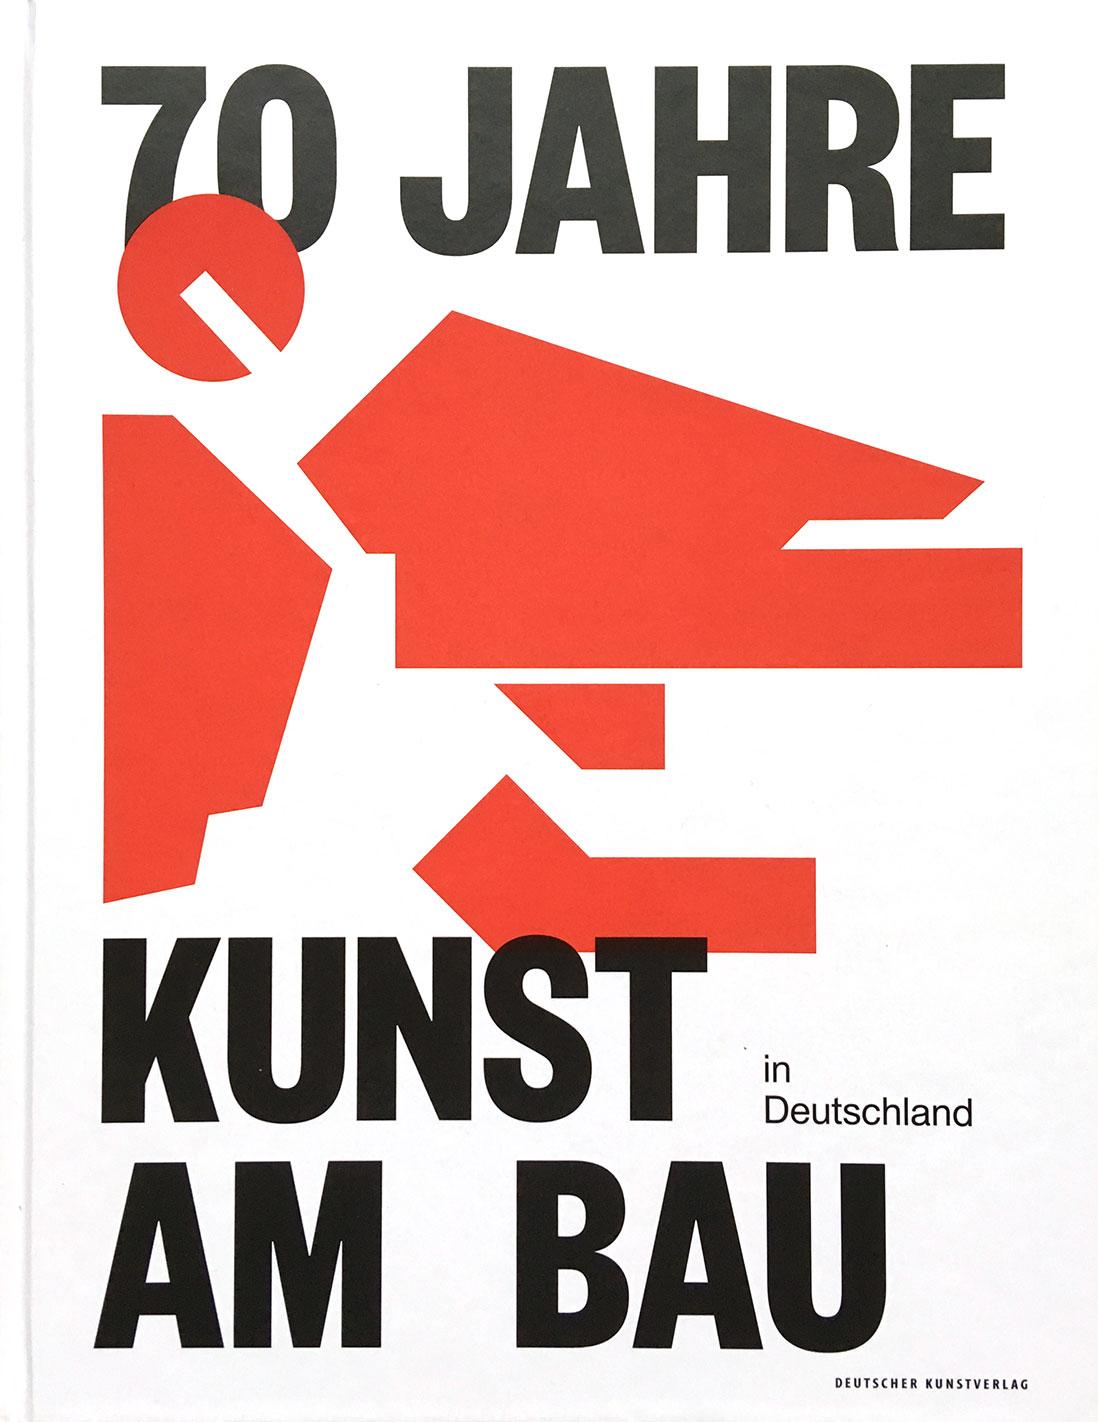 Deutscher Kunstverlag